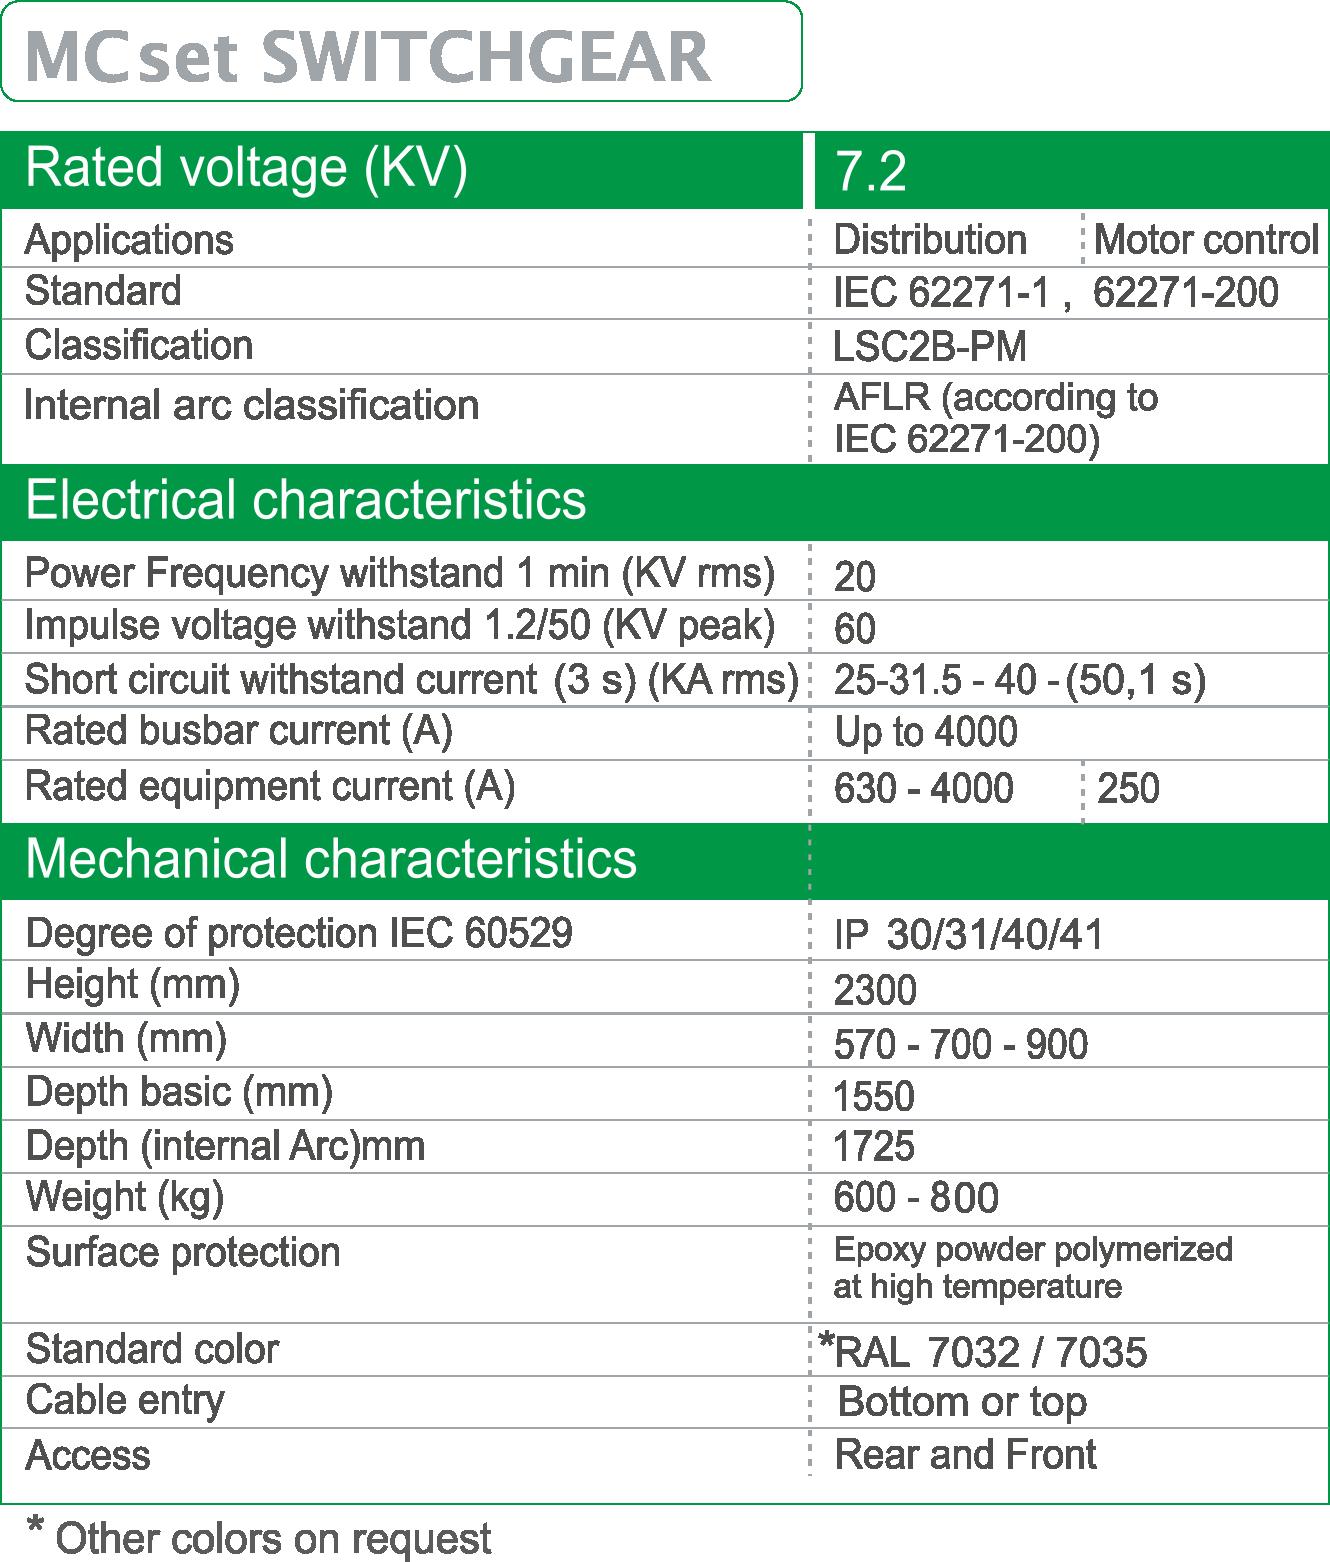 MCset-7.2KV